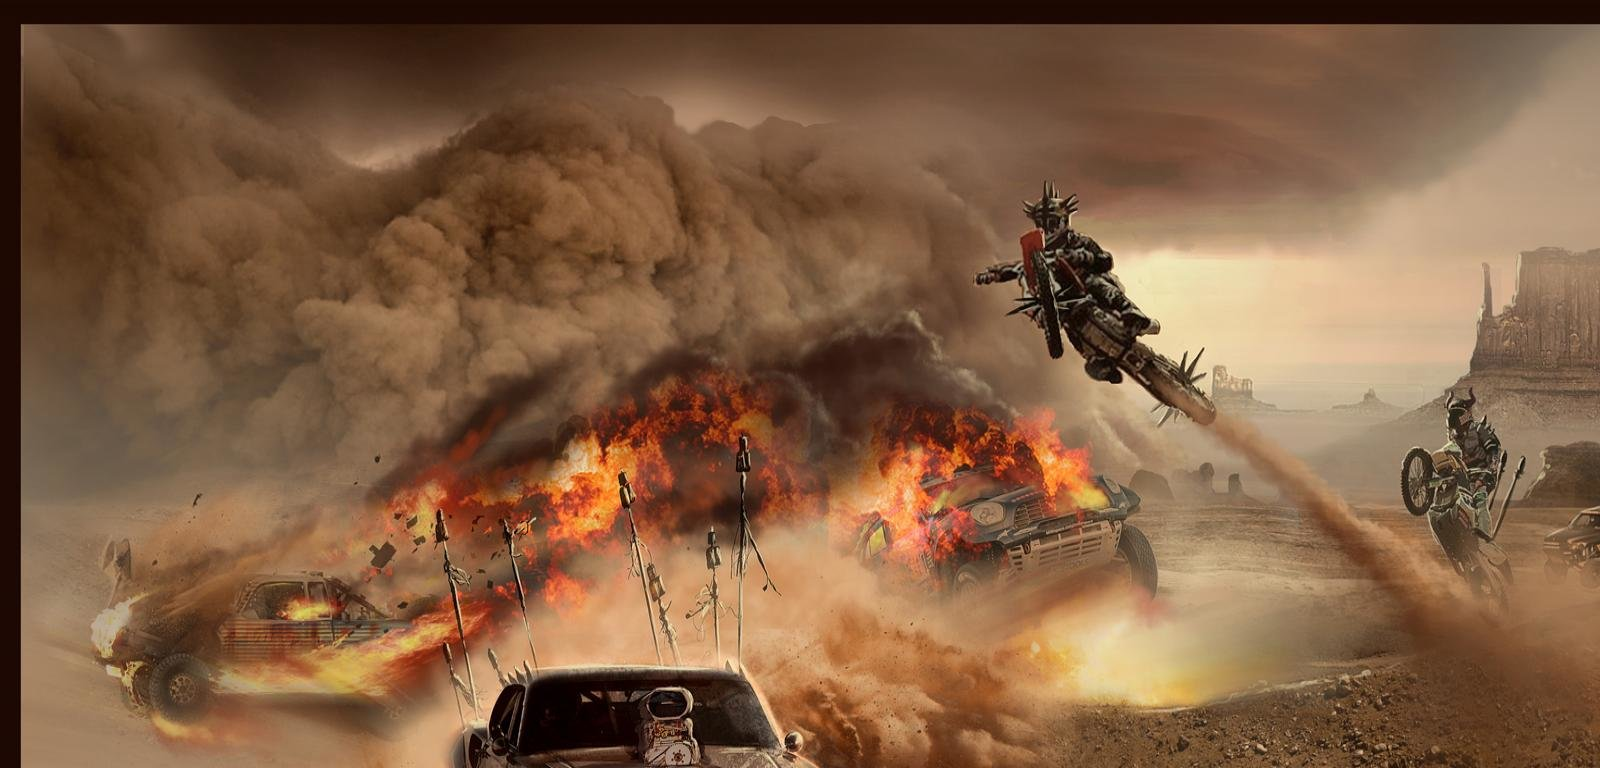 Download Hd 1600x768 Mad Max Fury Road Computer Wallpaper Id137470